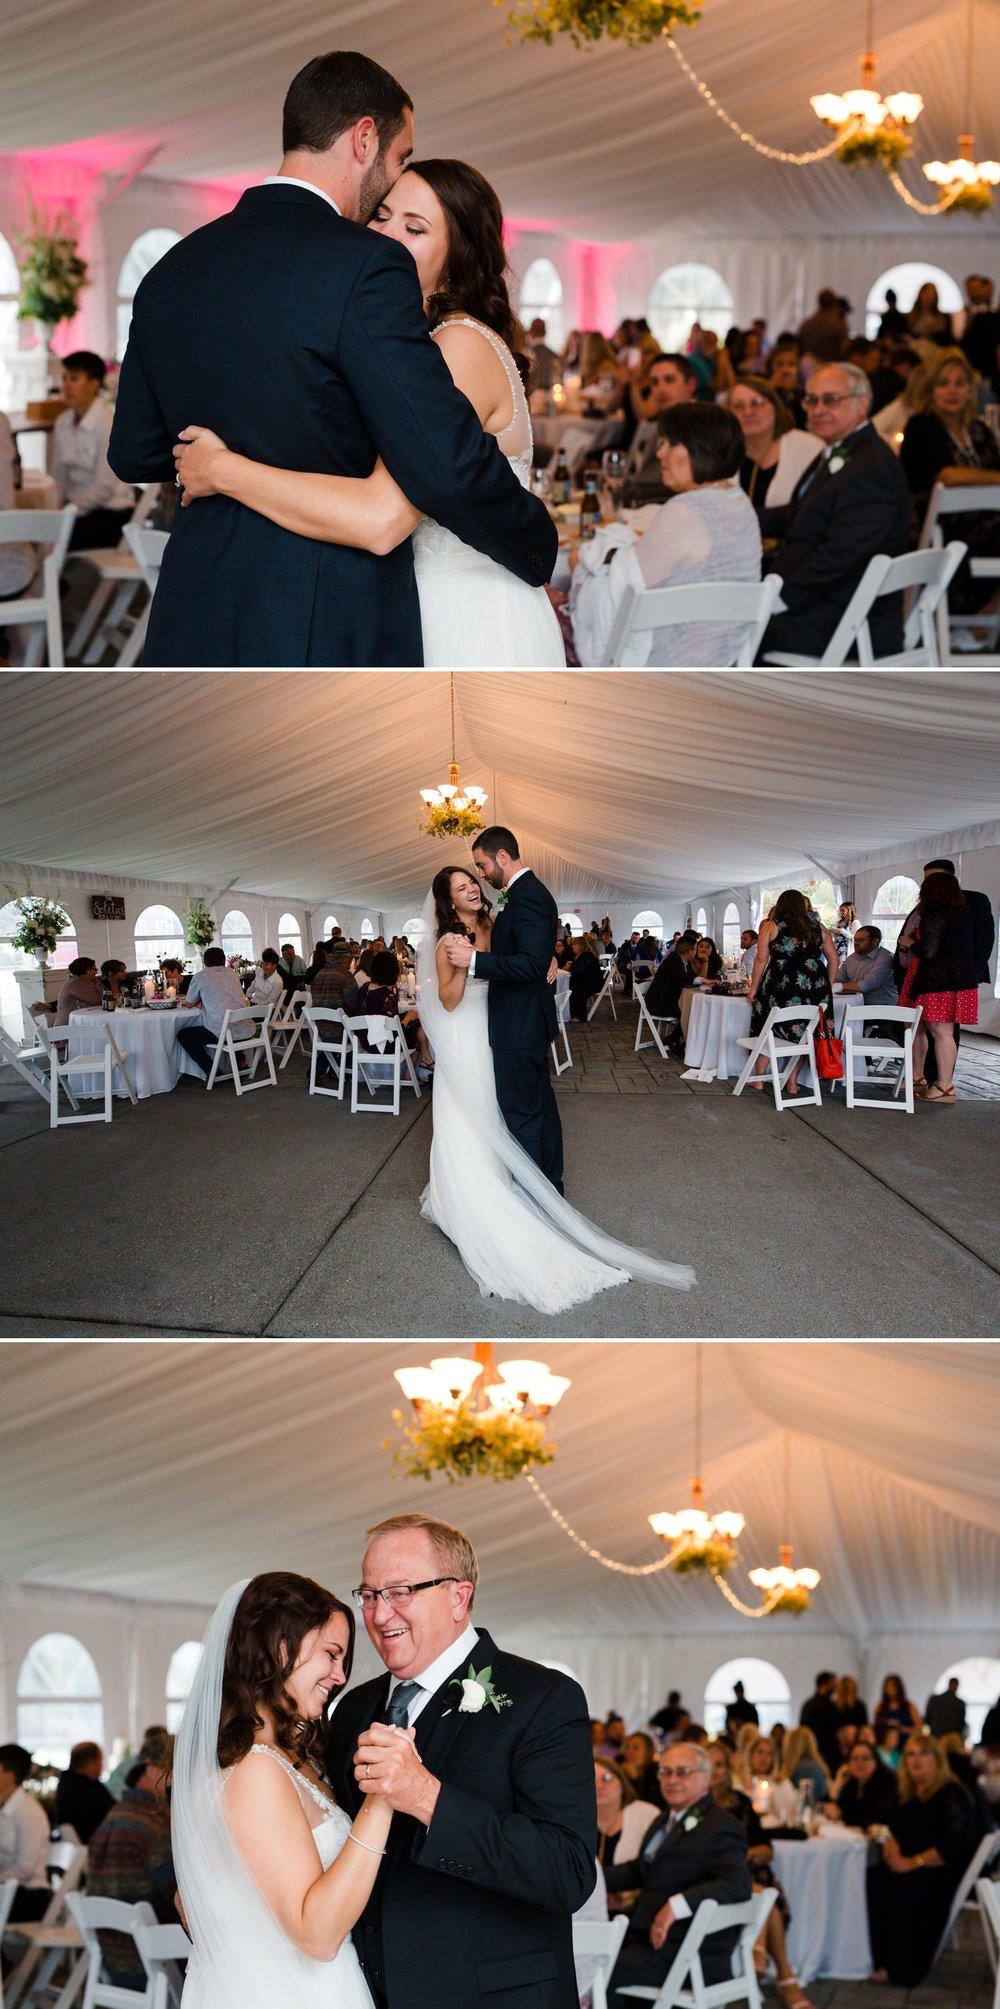 28-port-gamble-sweet-wedding-reception.jpg